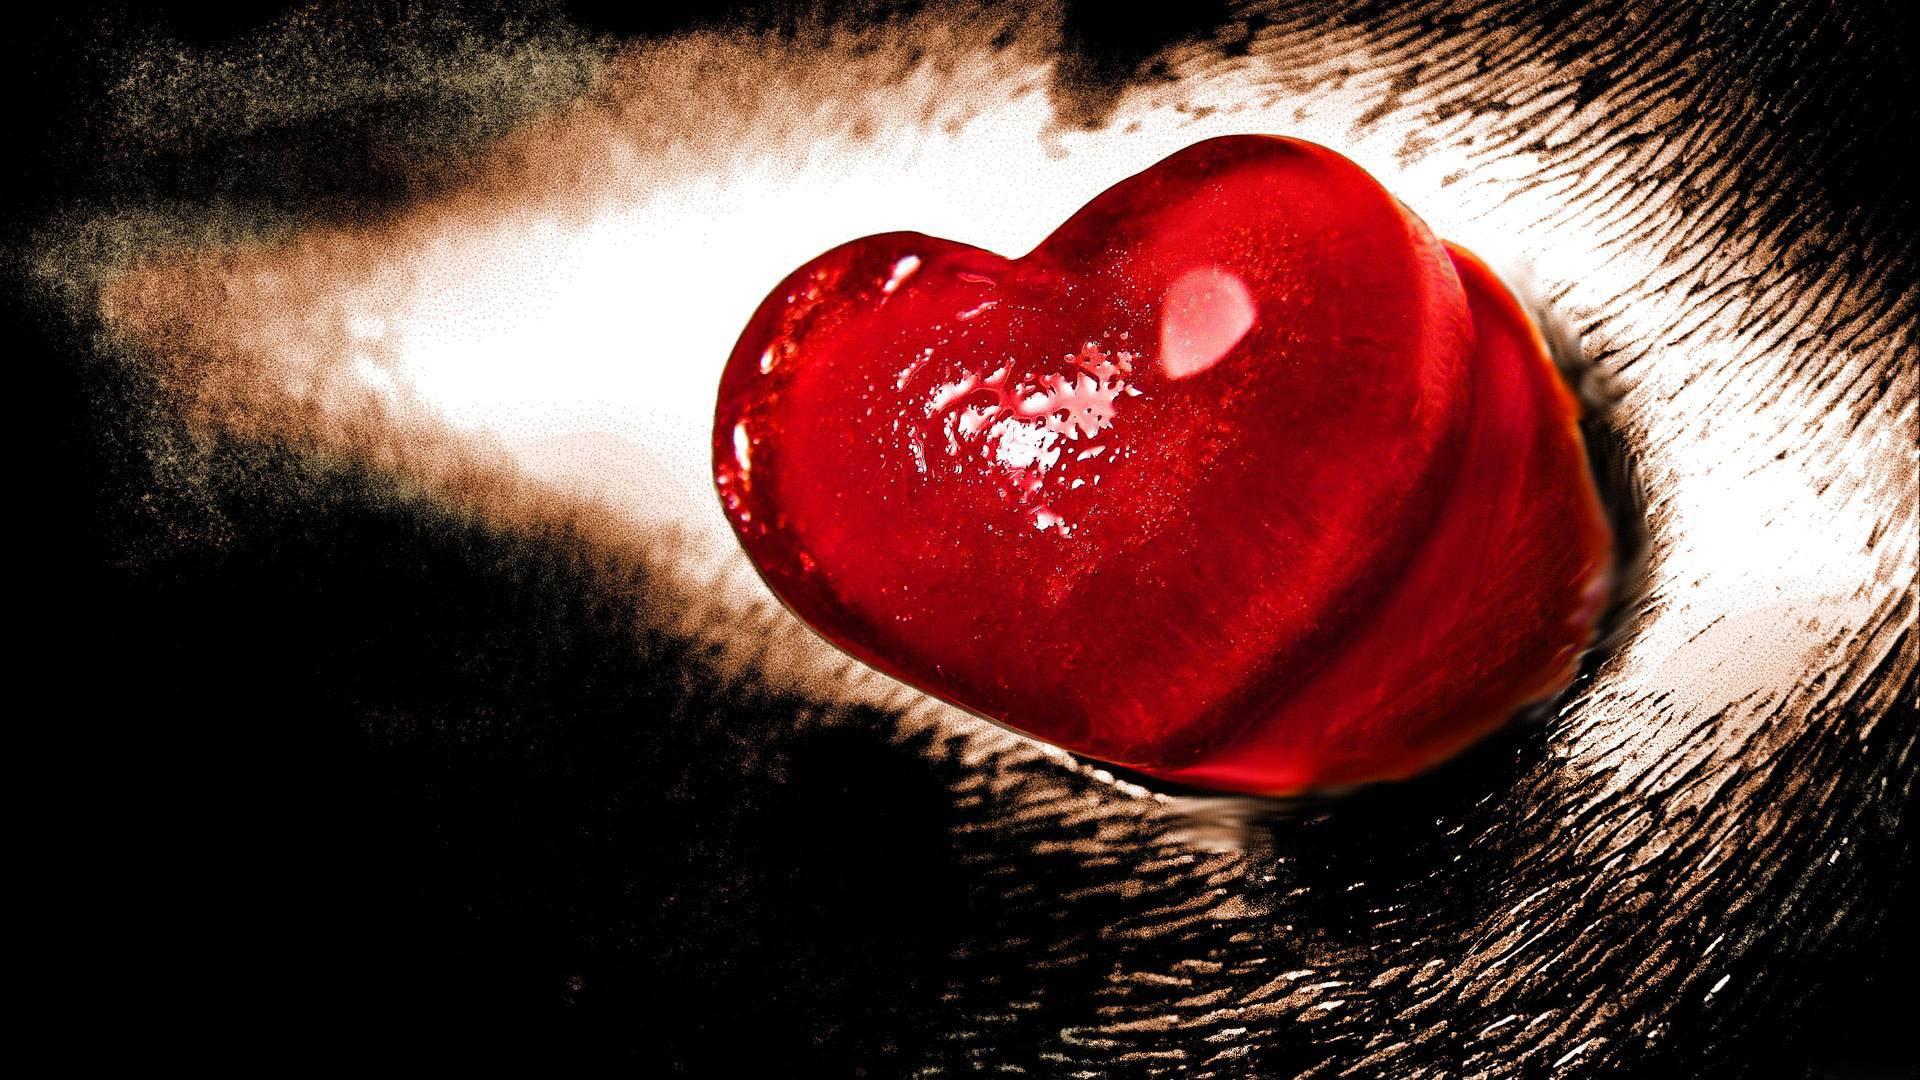 Wallpaper Valentine's Day Red Love 1920x1080 Full HD